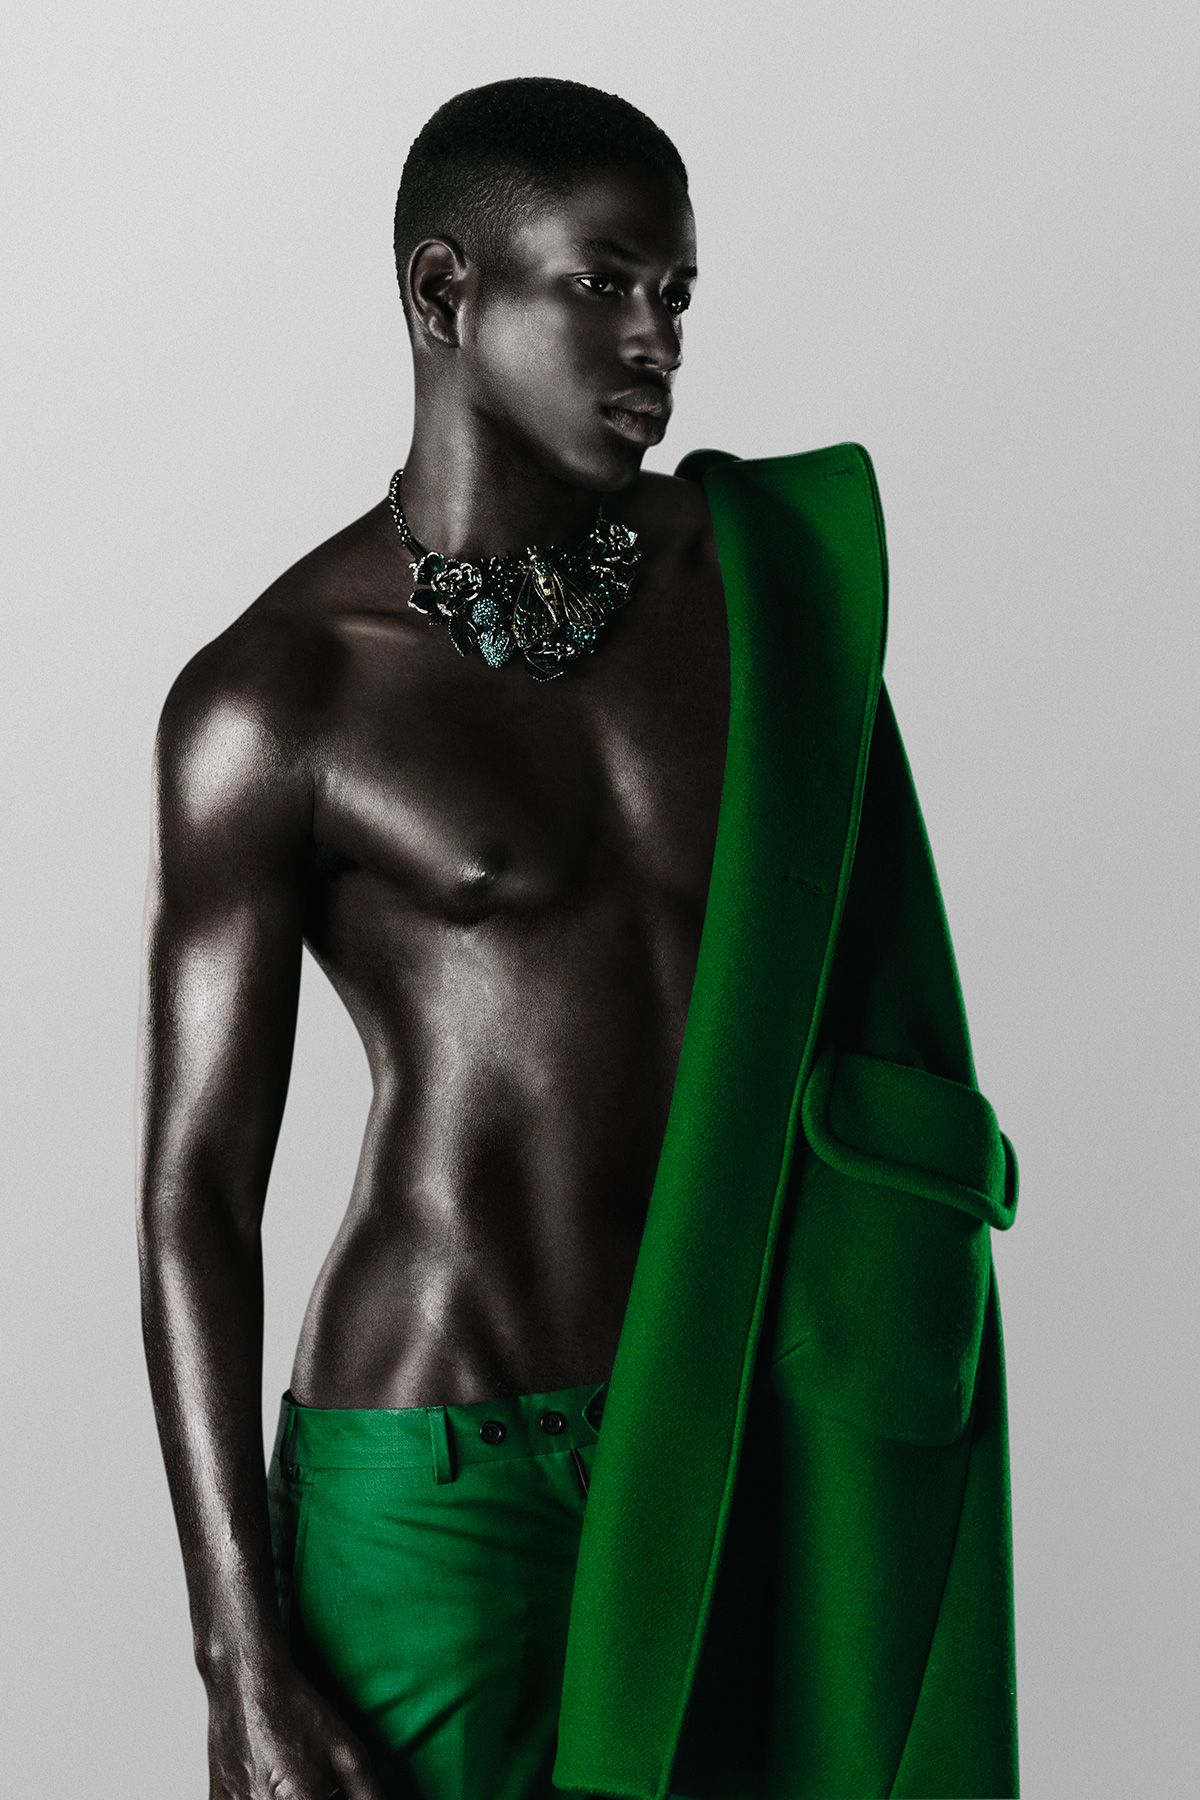 racebendingharrypotter:  tomboybklyn:  M'Baye - Ford Models NY photo by Rodrigo Maltchique  Blaise Zabini